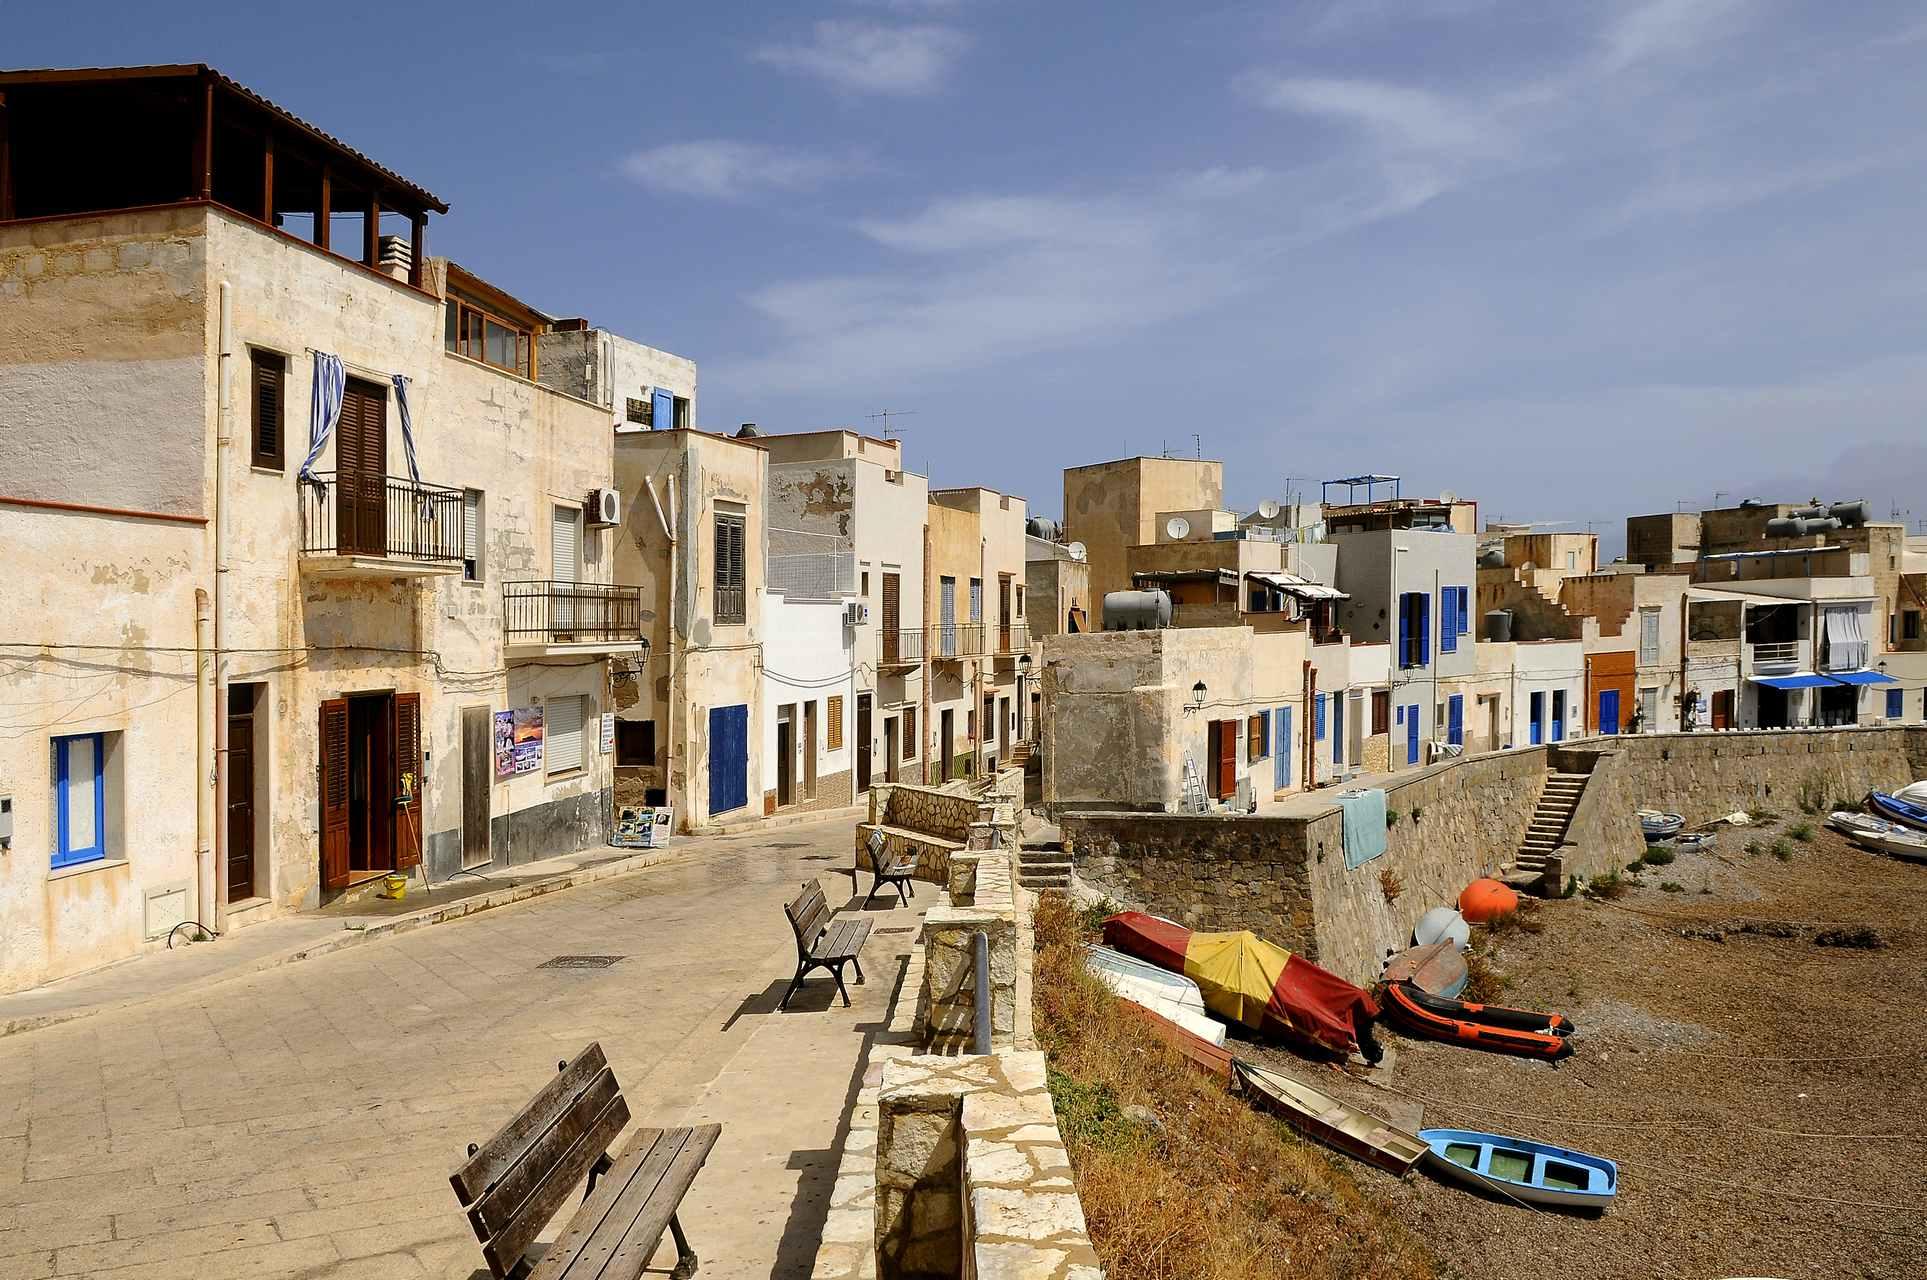 Mare e Vento | Egadi in barca a vela | Vacanze in barca a vela | isole Egadi